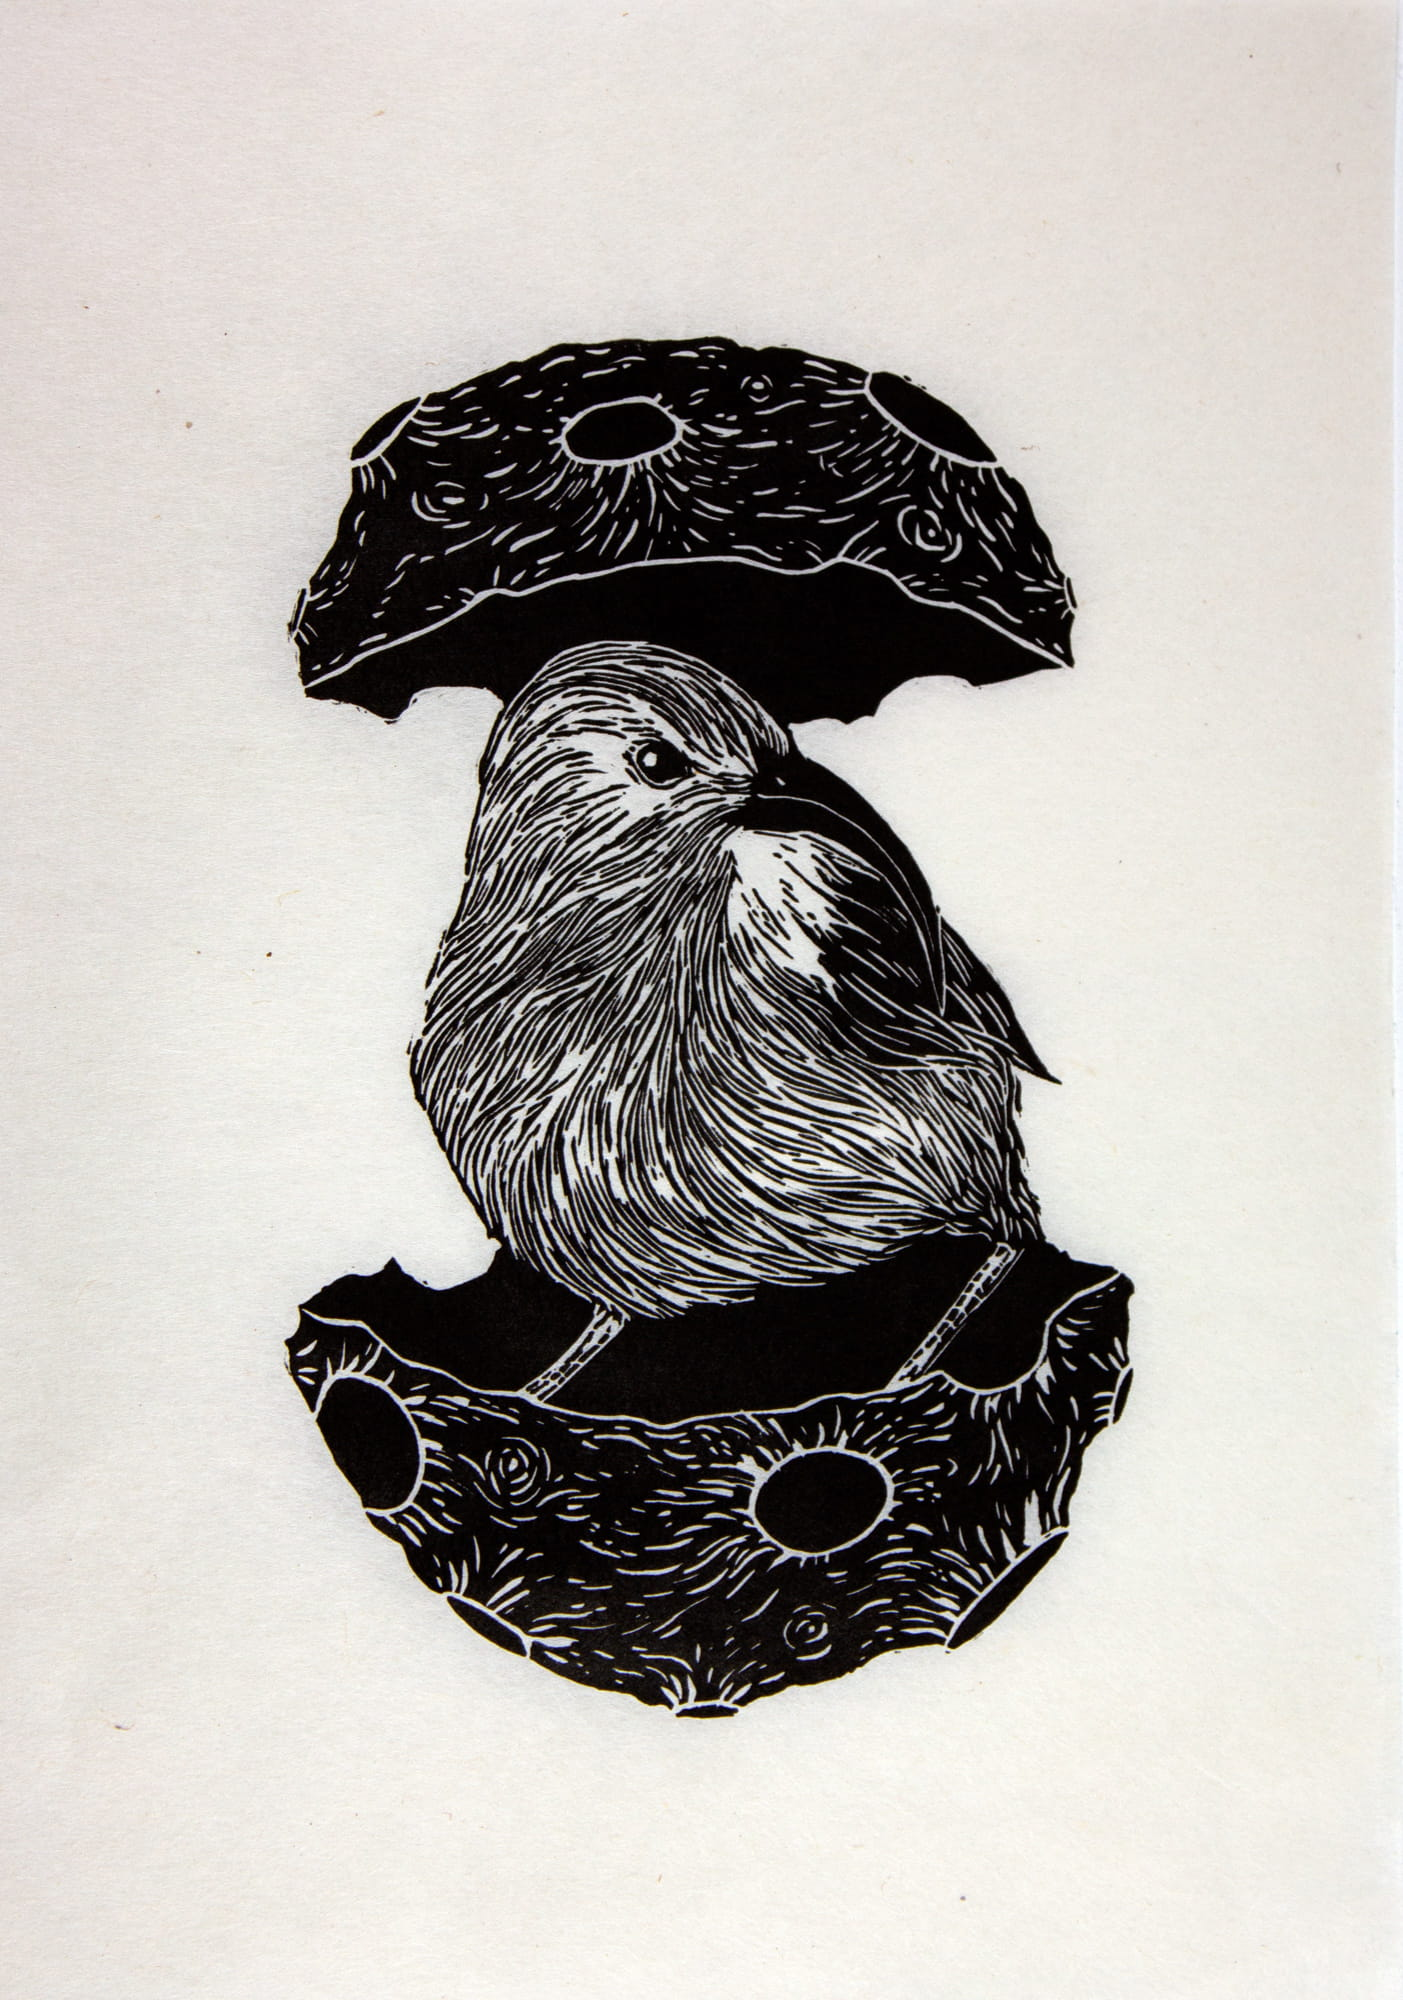 Linocut of a bird hatching from an egg by Kawelina Cruz